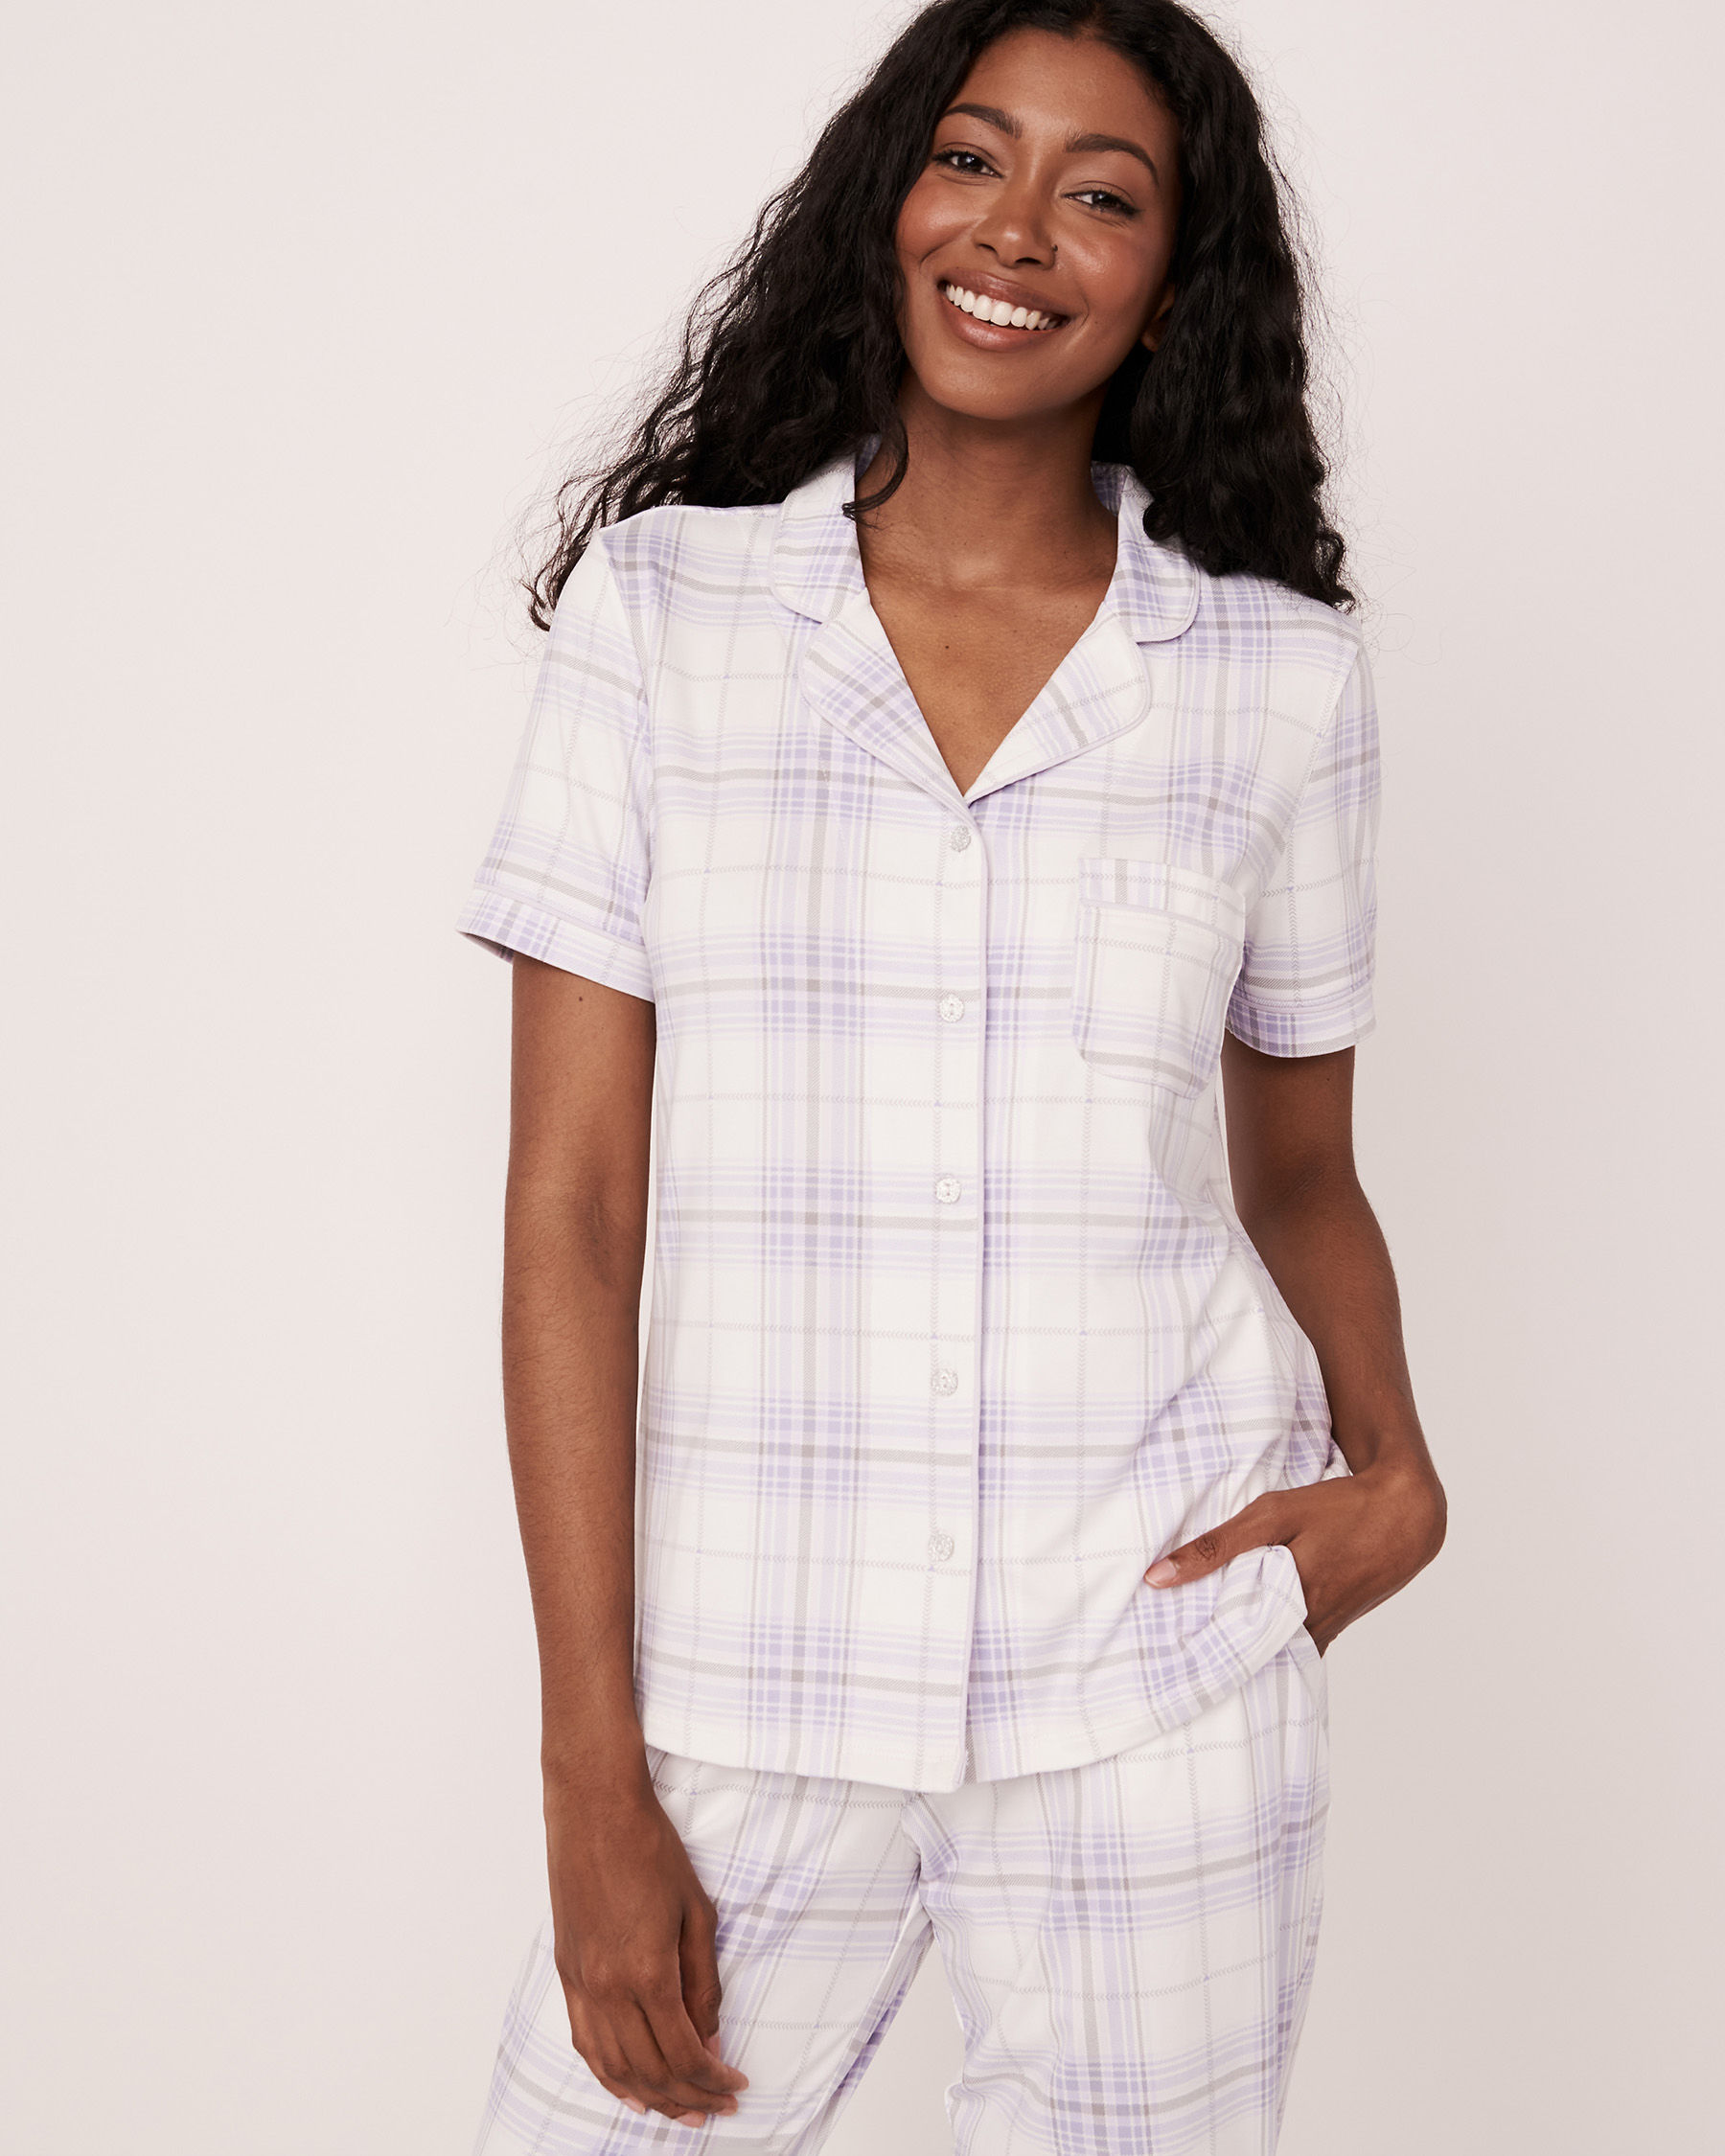 LA VIE EN ROSE Short Sleeve Shirt Plaid 40100147 - View1